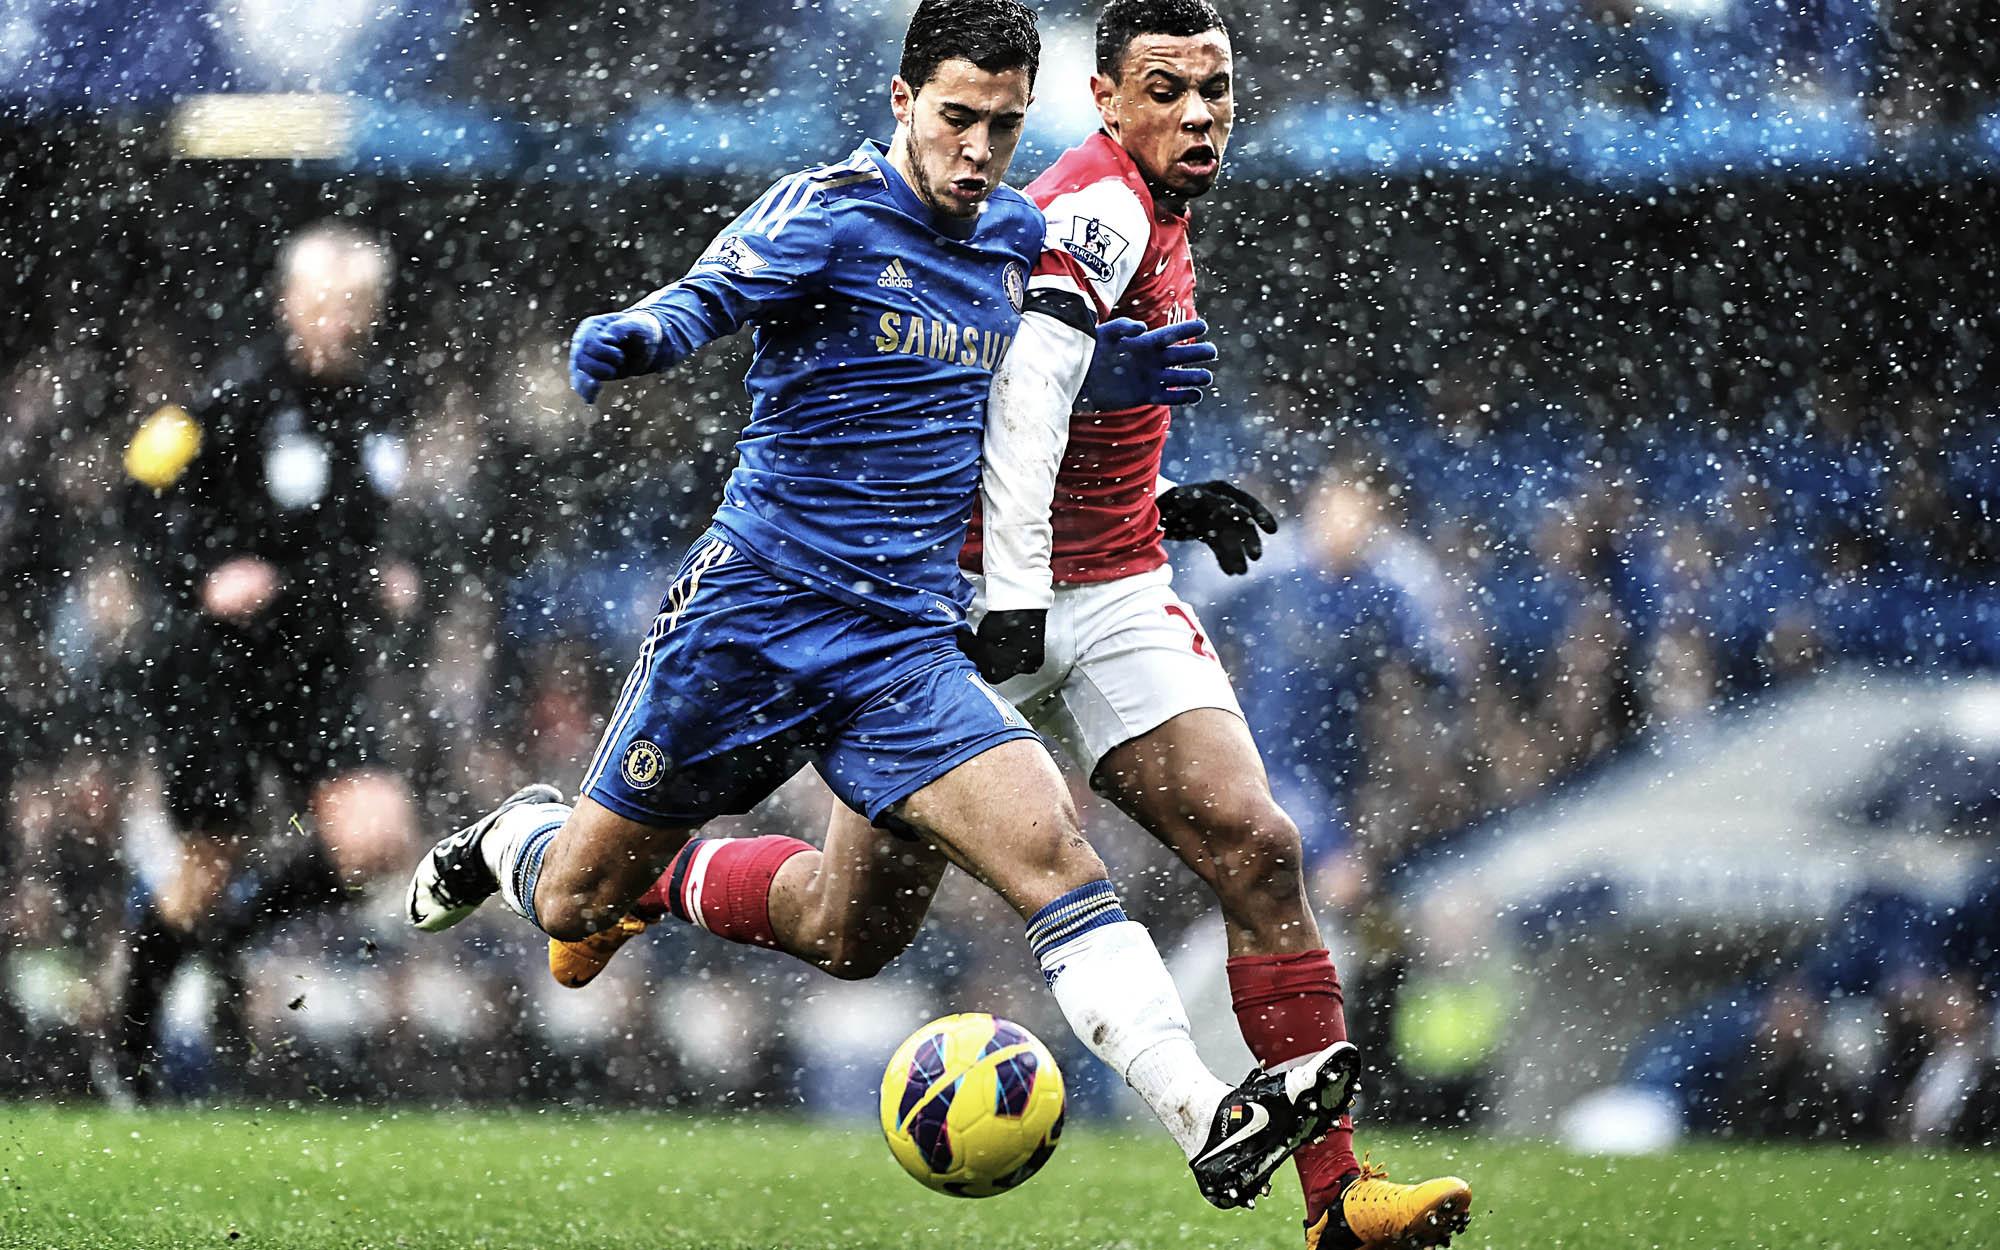 Soccer Desktop Wallpaper 70 Pictures